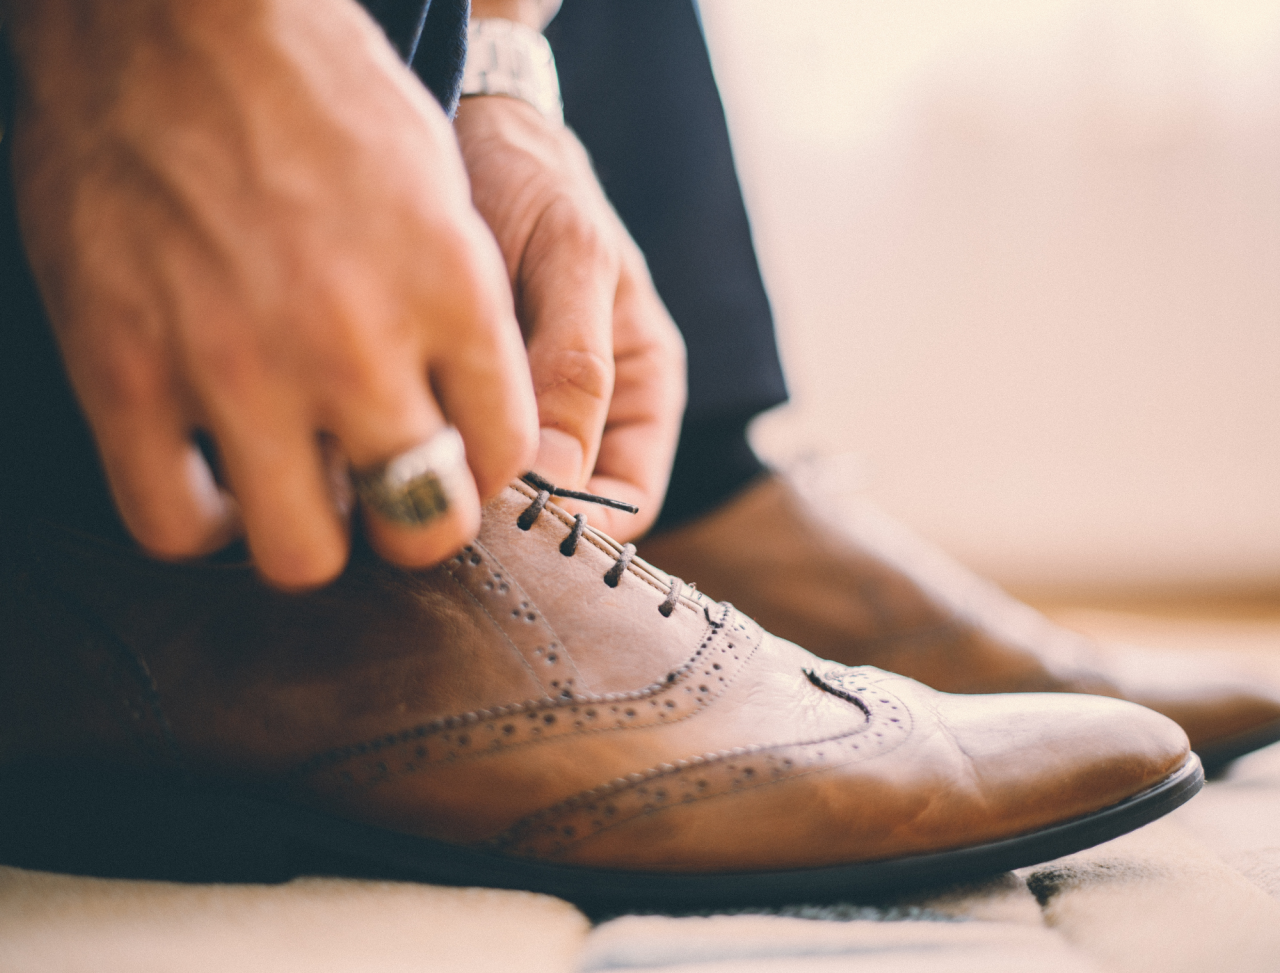 https://entrepreneurmindz.com/wp-content/uploads/2021/07/How-To-Start-An-Online-Shoe-Business-for-Men-1280x973.png